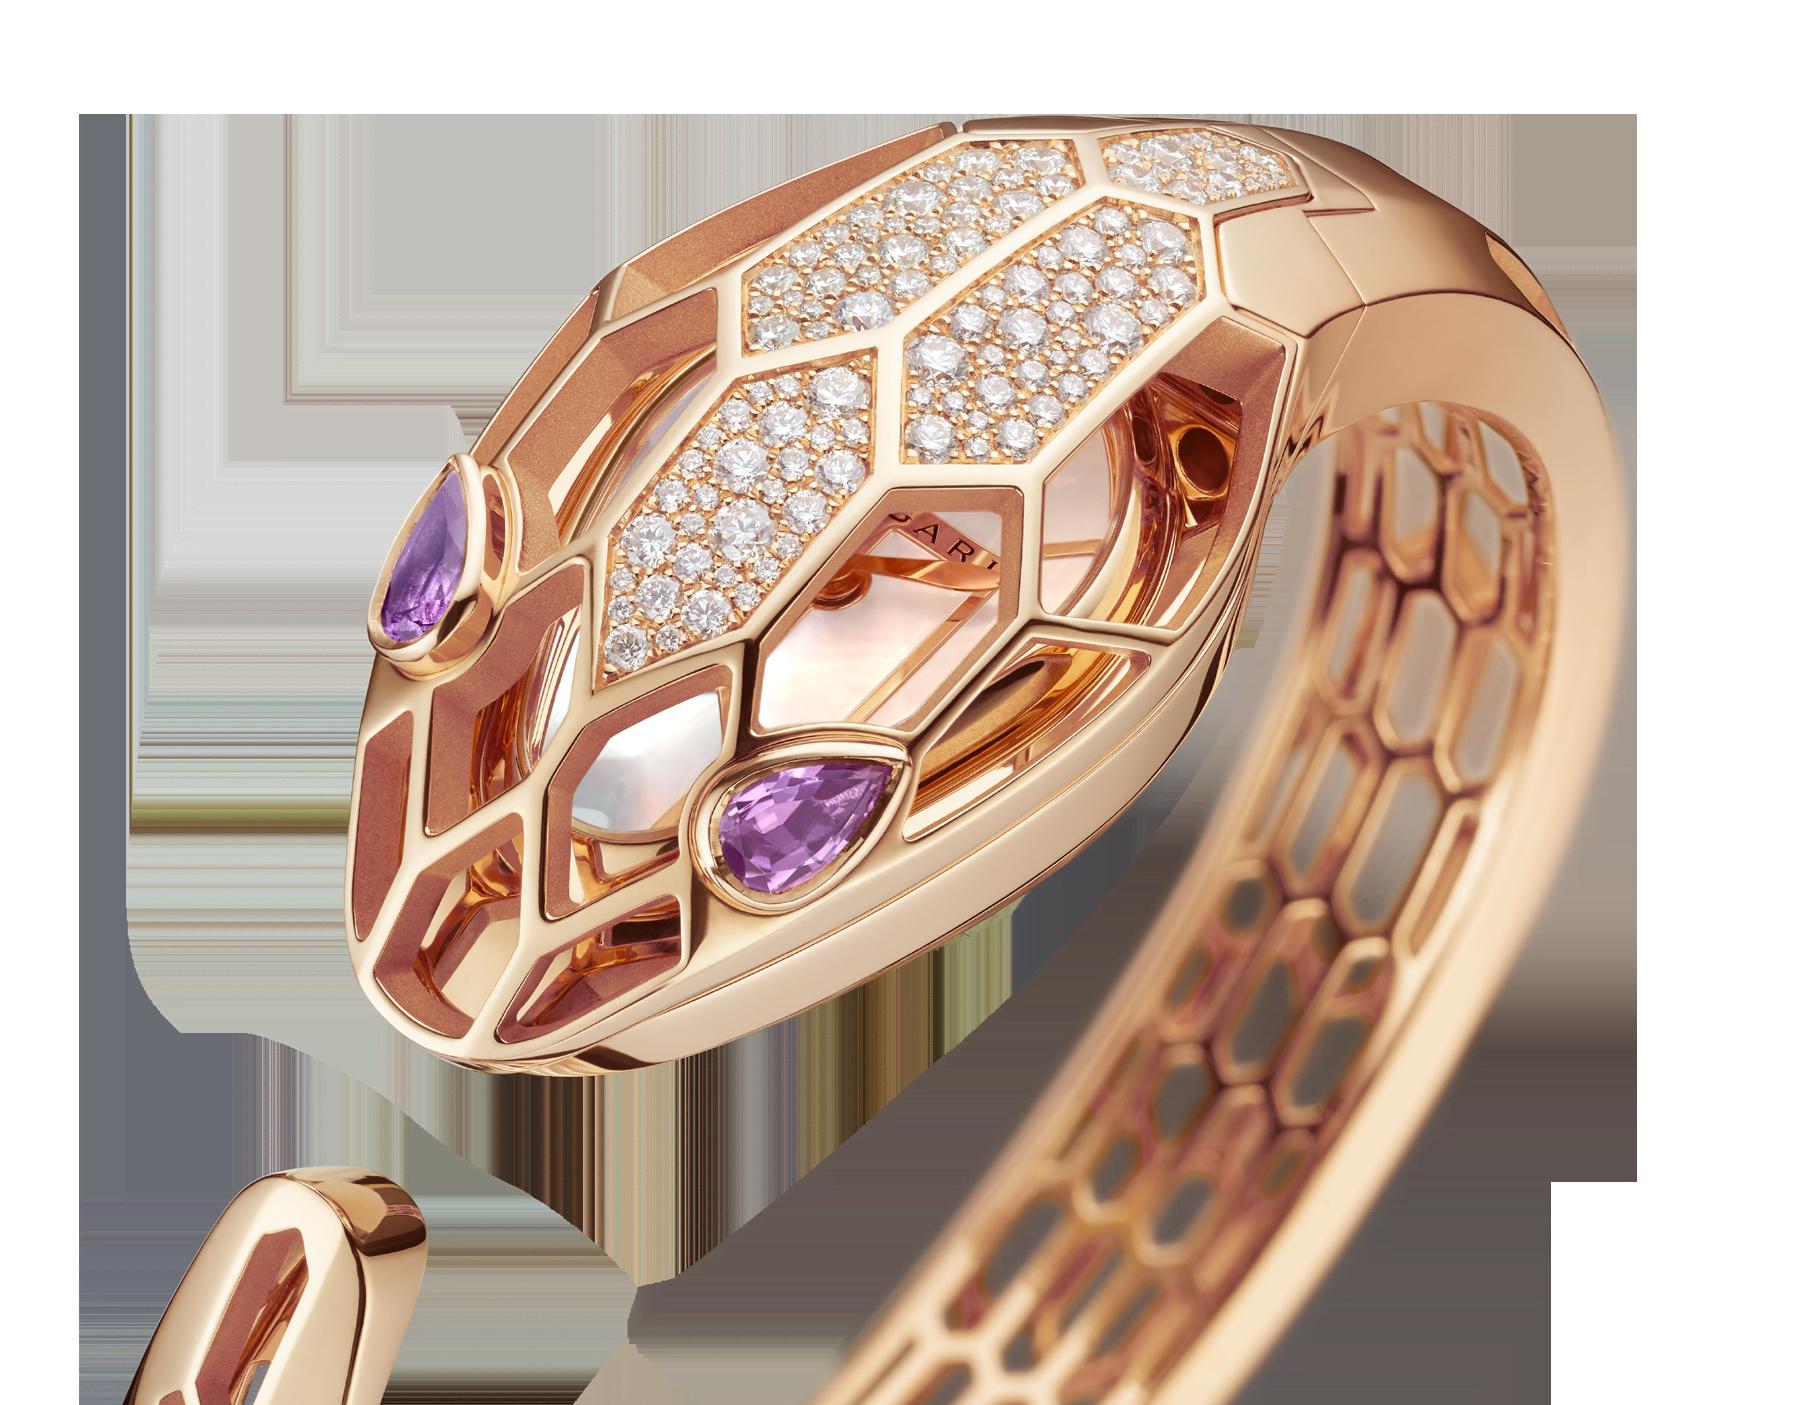 Serpenti Misteriosi Secret 腕錶,18K 玫瑰金鏤空錶殼鑲飾圓形明亮型切割鑽石,白色珍珠母貝錶盤,18K 玫瑰金鏤空手鐲式錶帶,蛇眼鑲飾梨形紫水晶。M 尺寸。 SrpntMister-SecretWtc-rose-gold image 4